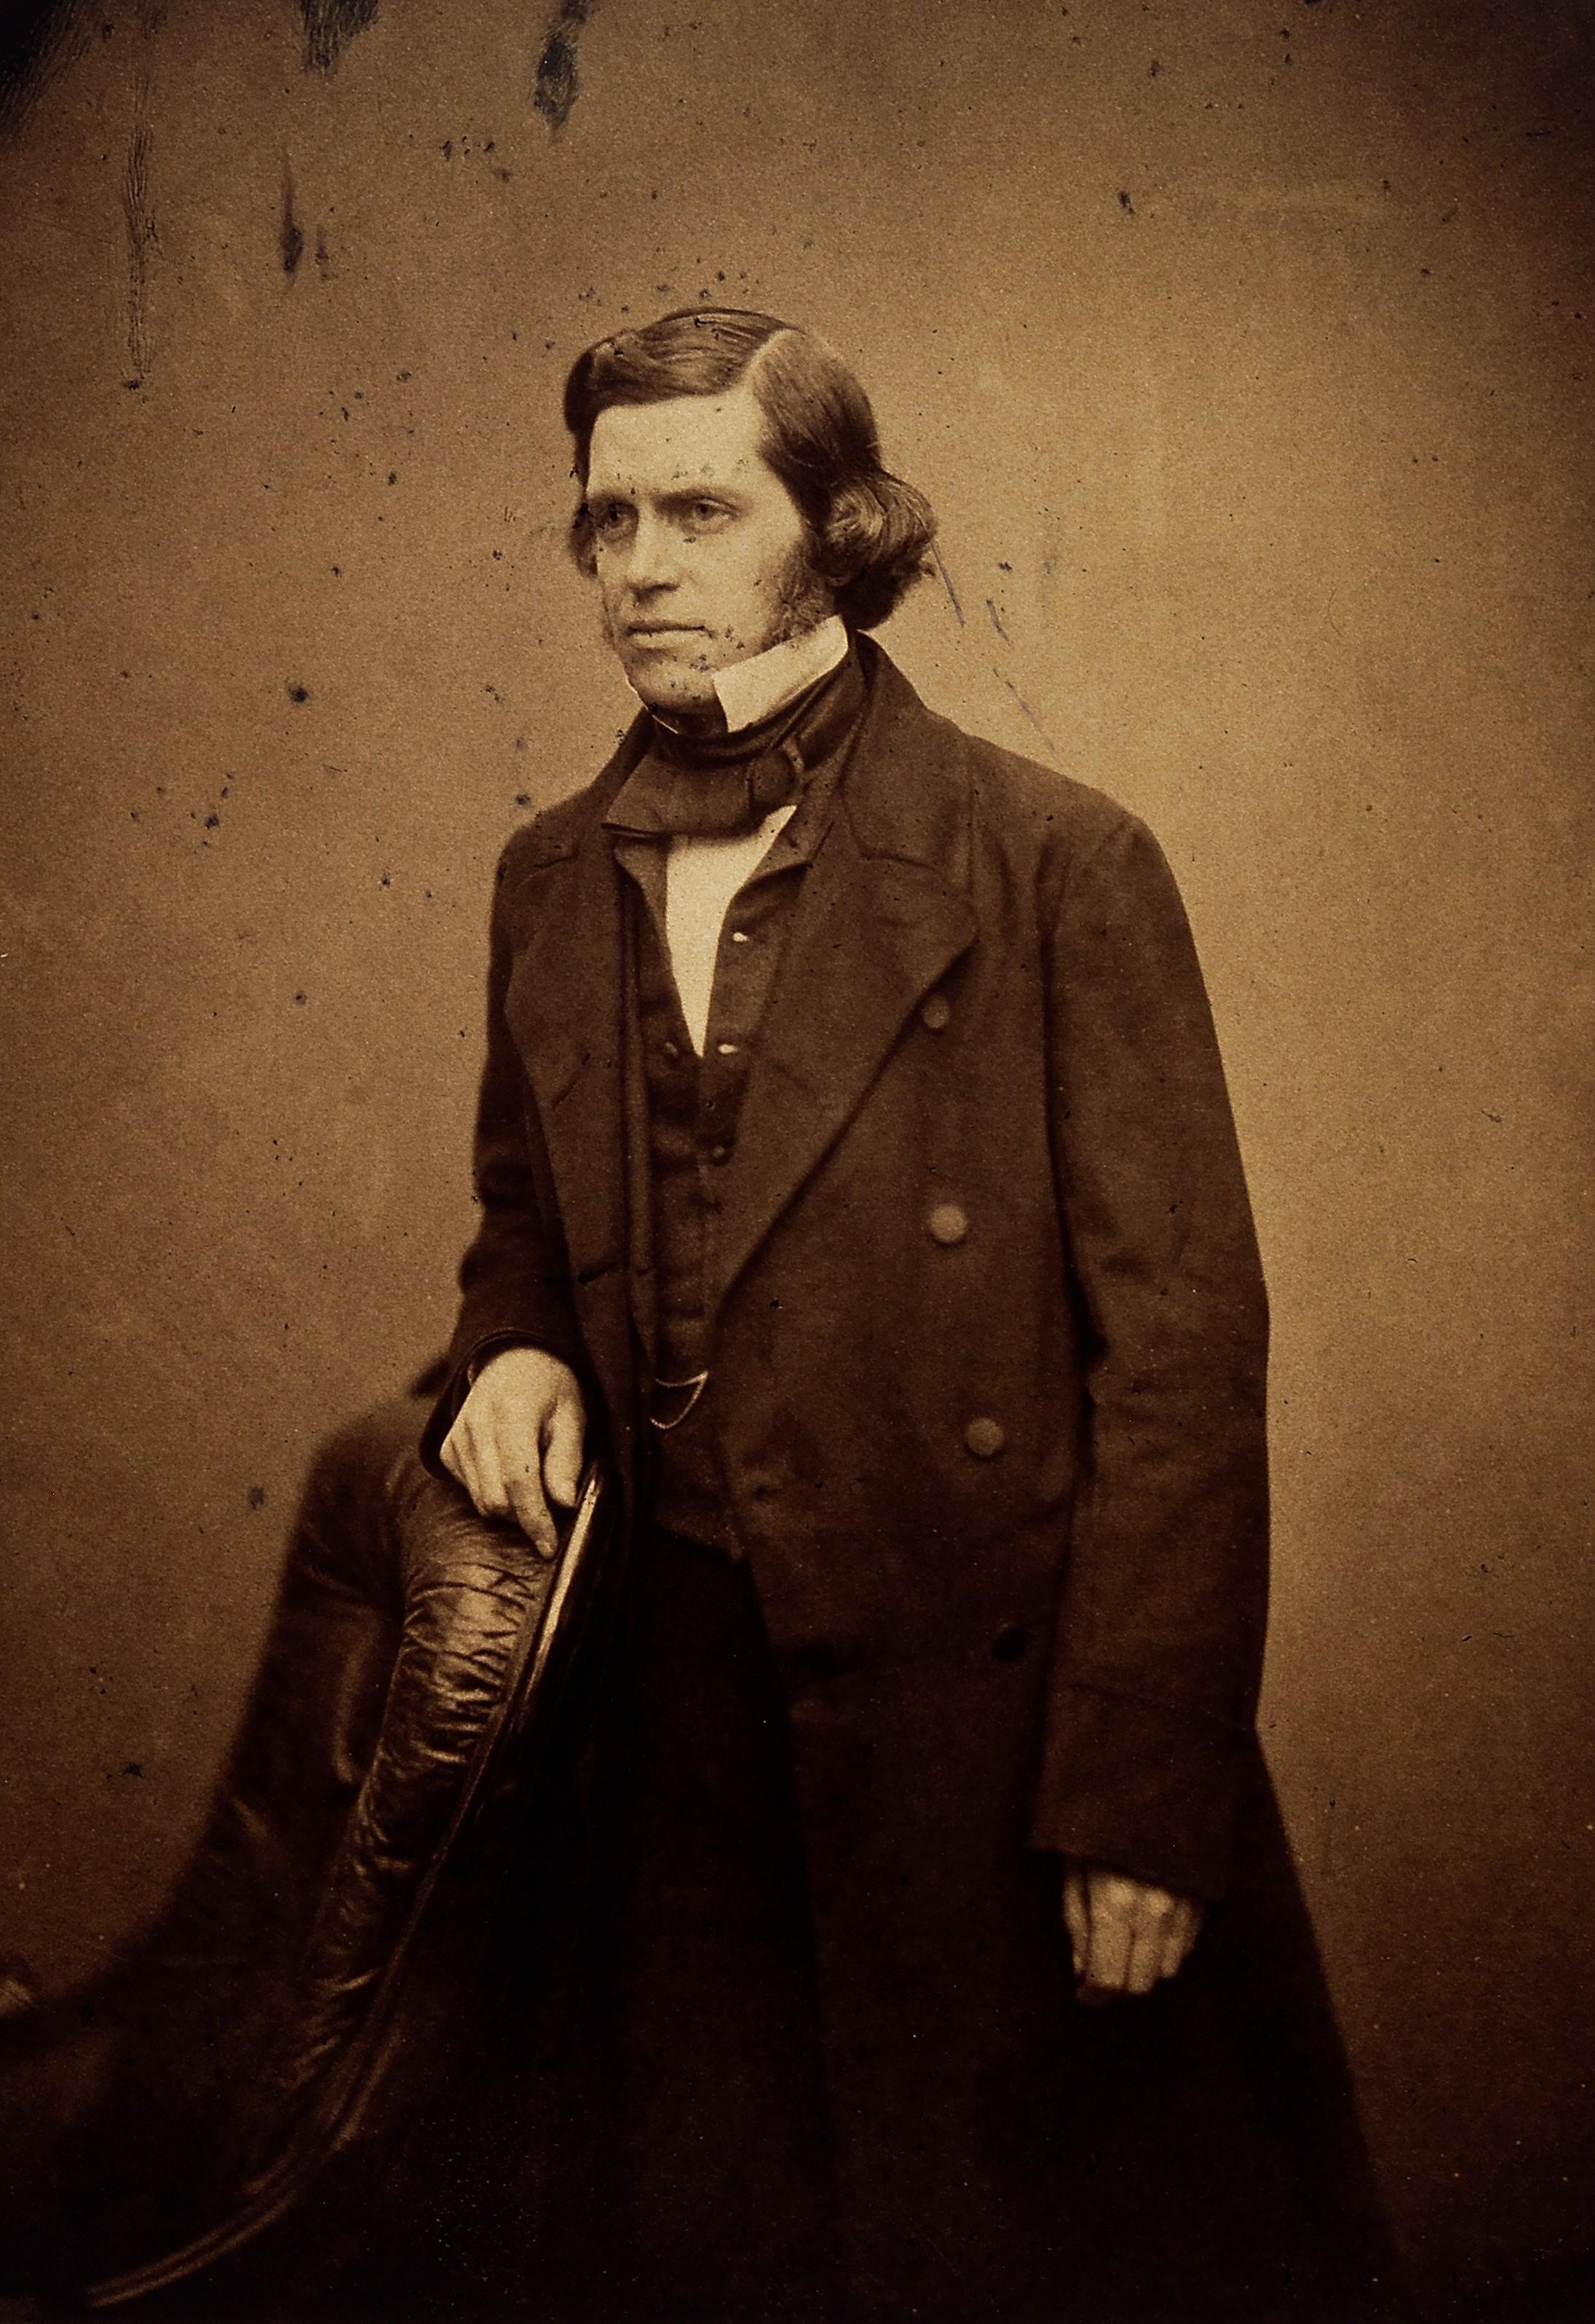 File:Sir William Bowman. Photograph by Maull & Polyblank. Wellcome  V0026069.jpg